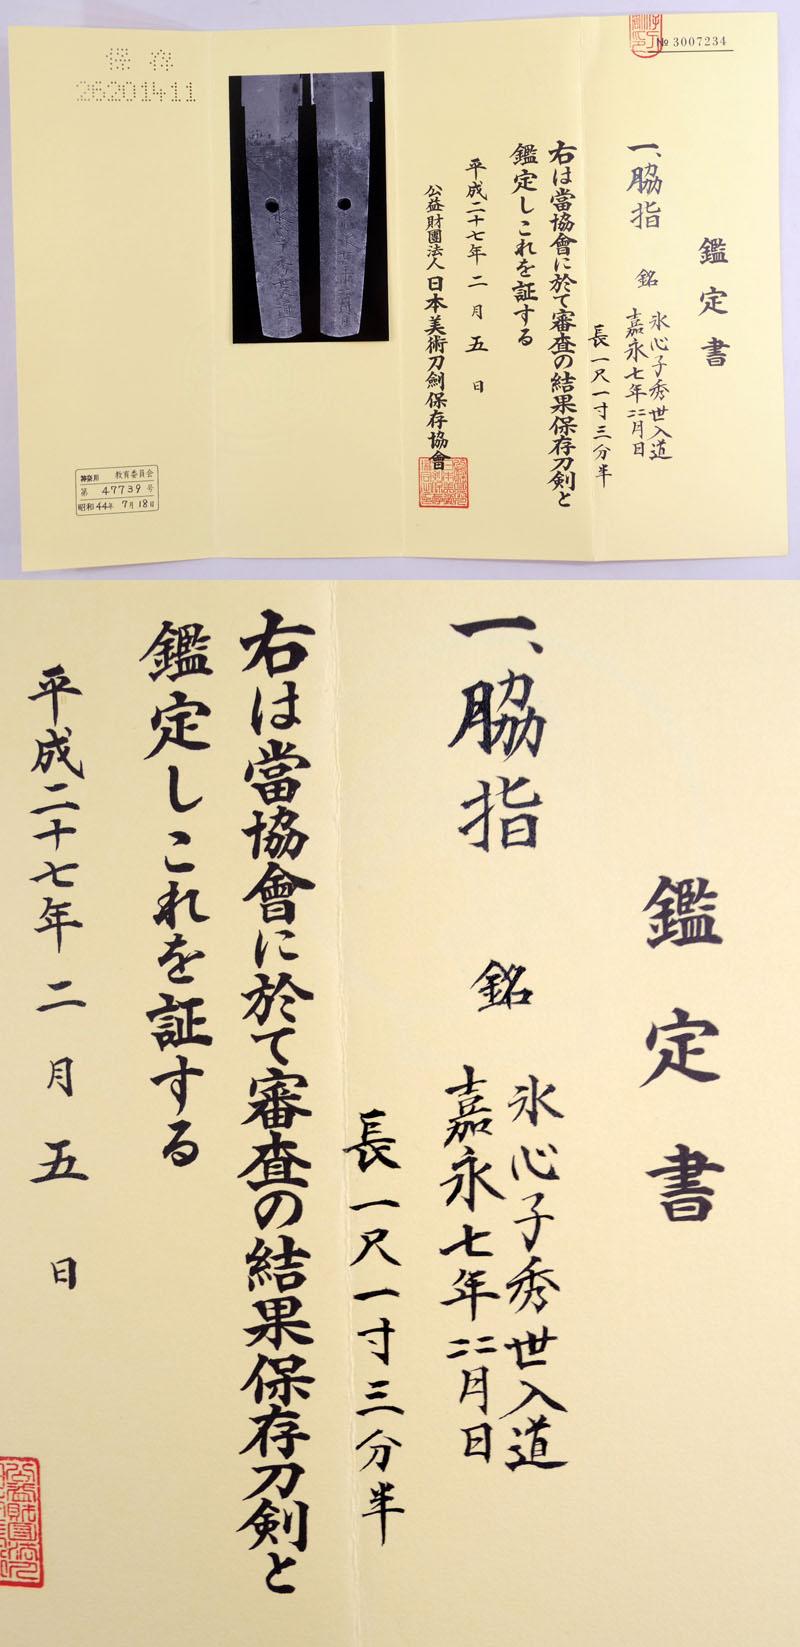 氷心子秀世入道 Picture of Certificate